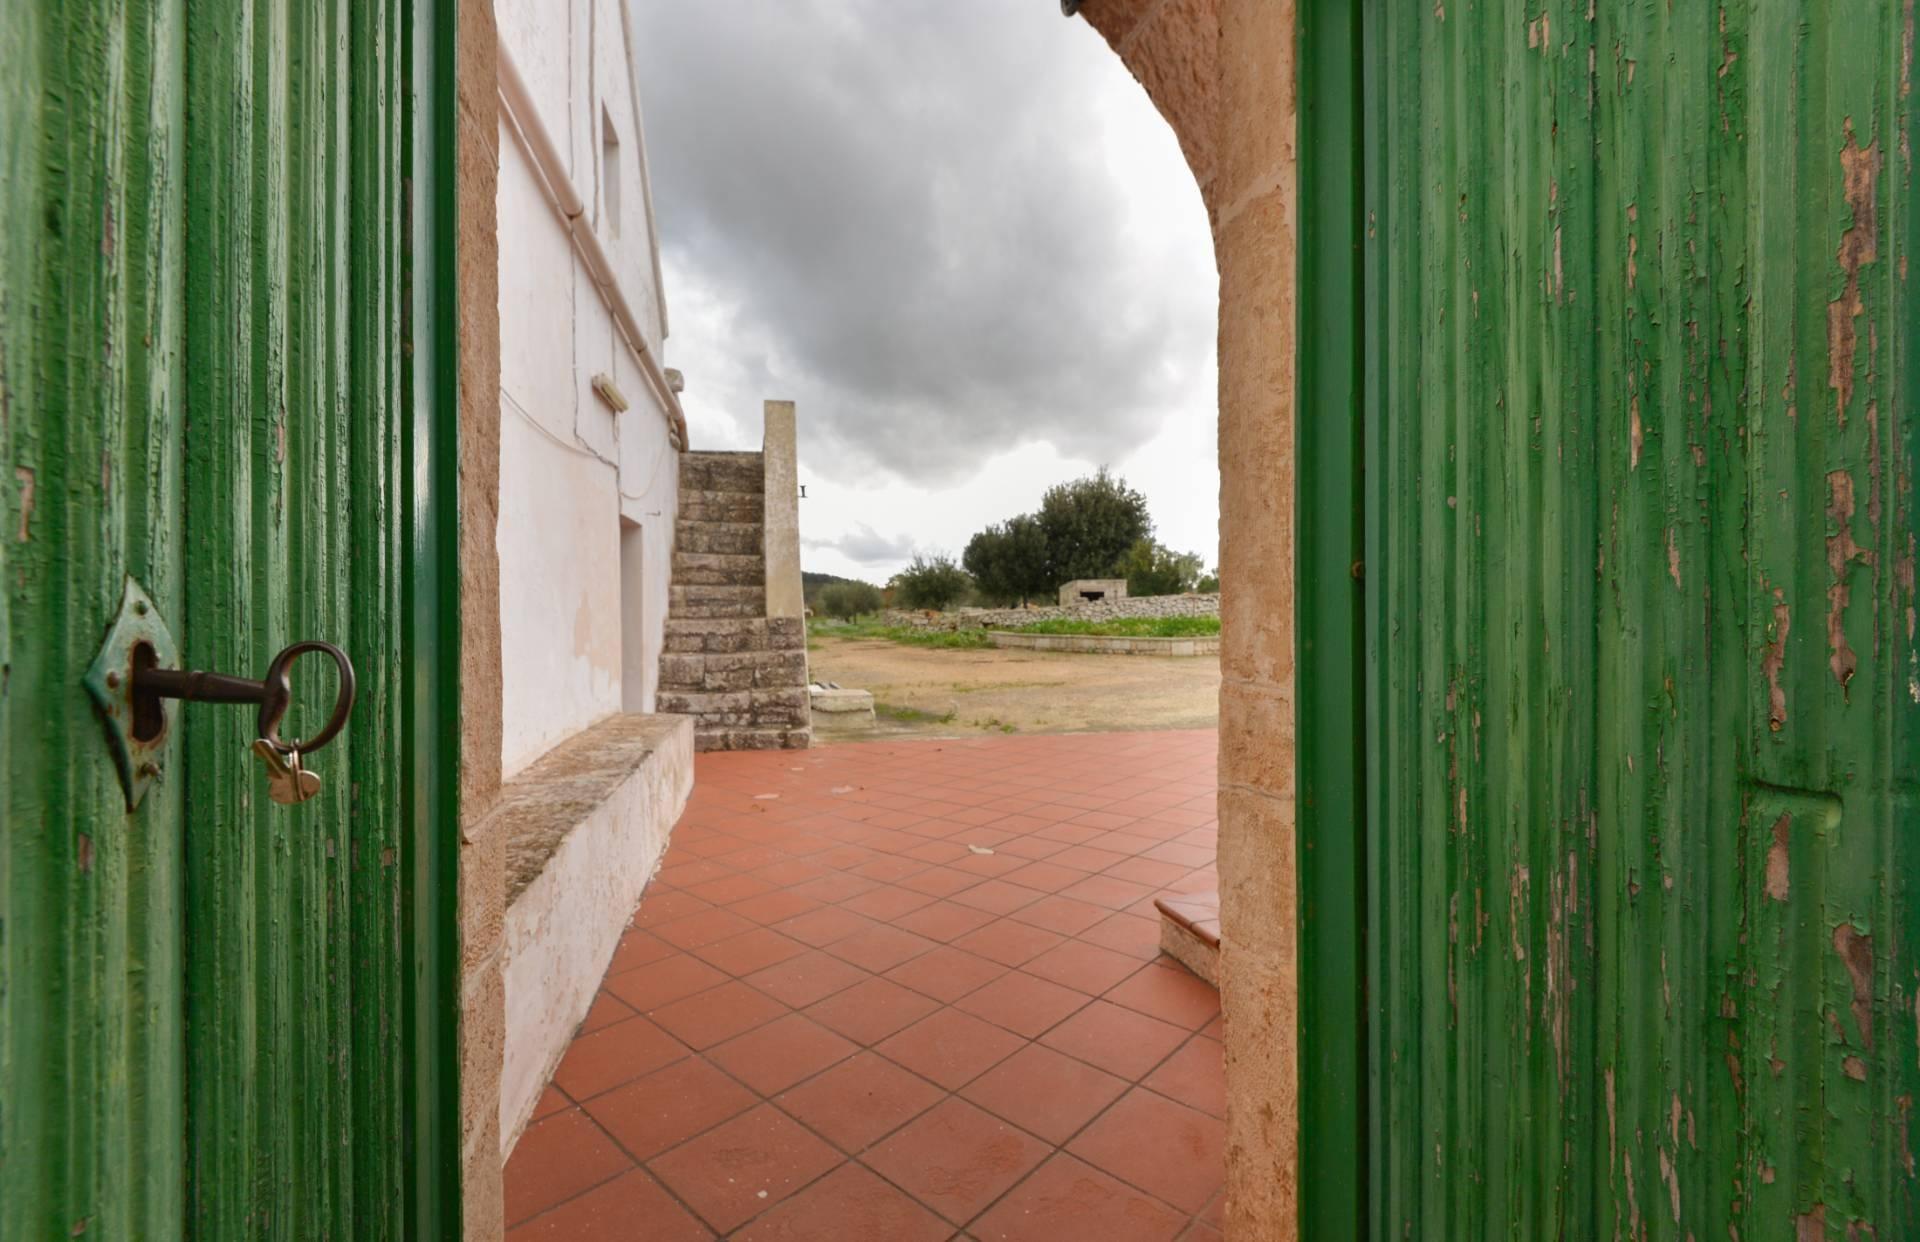 Appartamento in vendita a Ostuni, 8 locali, Trattative riservate | CambioCasa.it